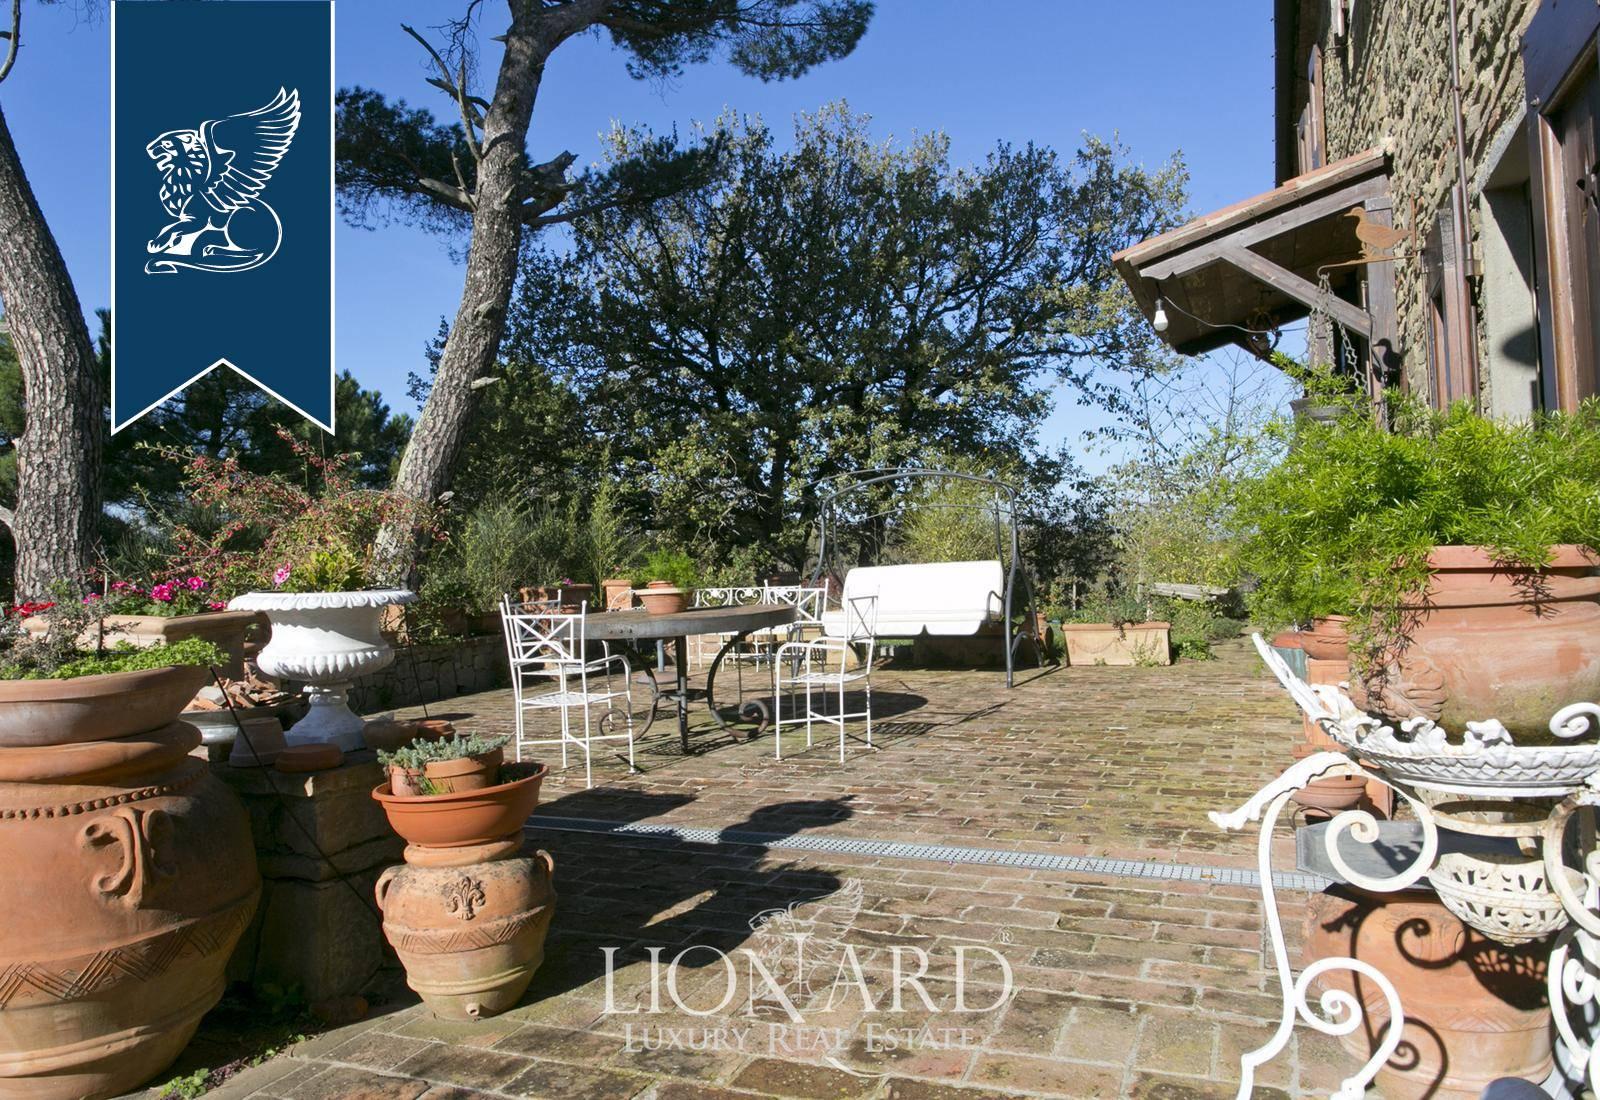 Villa in Vendita a Gaiole In Chianti: 0 locali, 485 mq - Foto 1